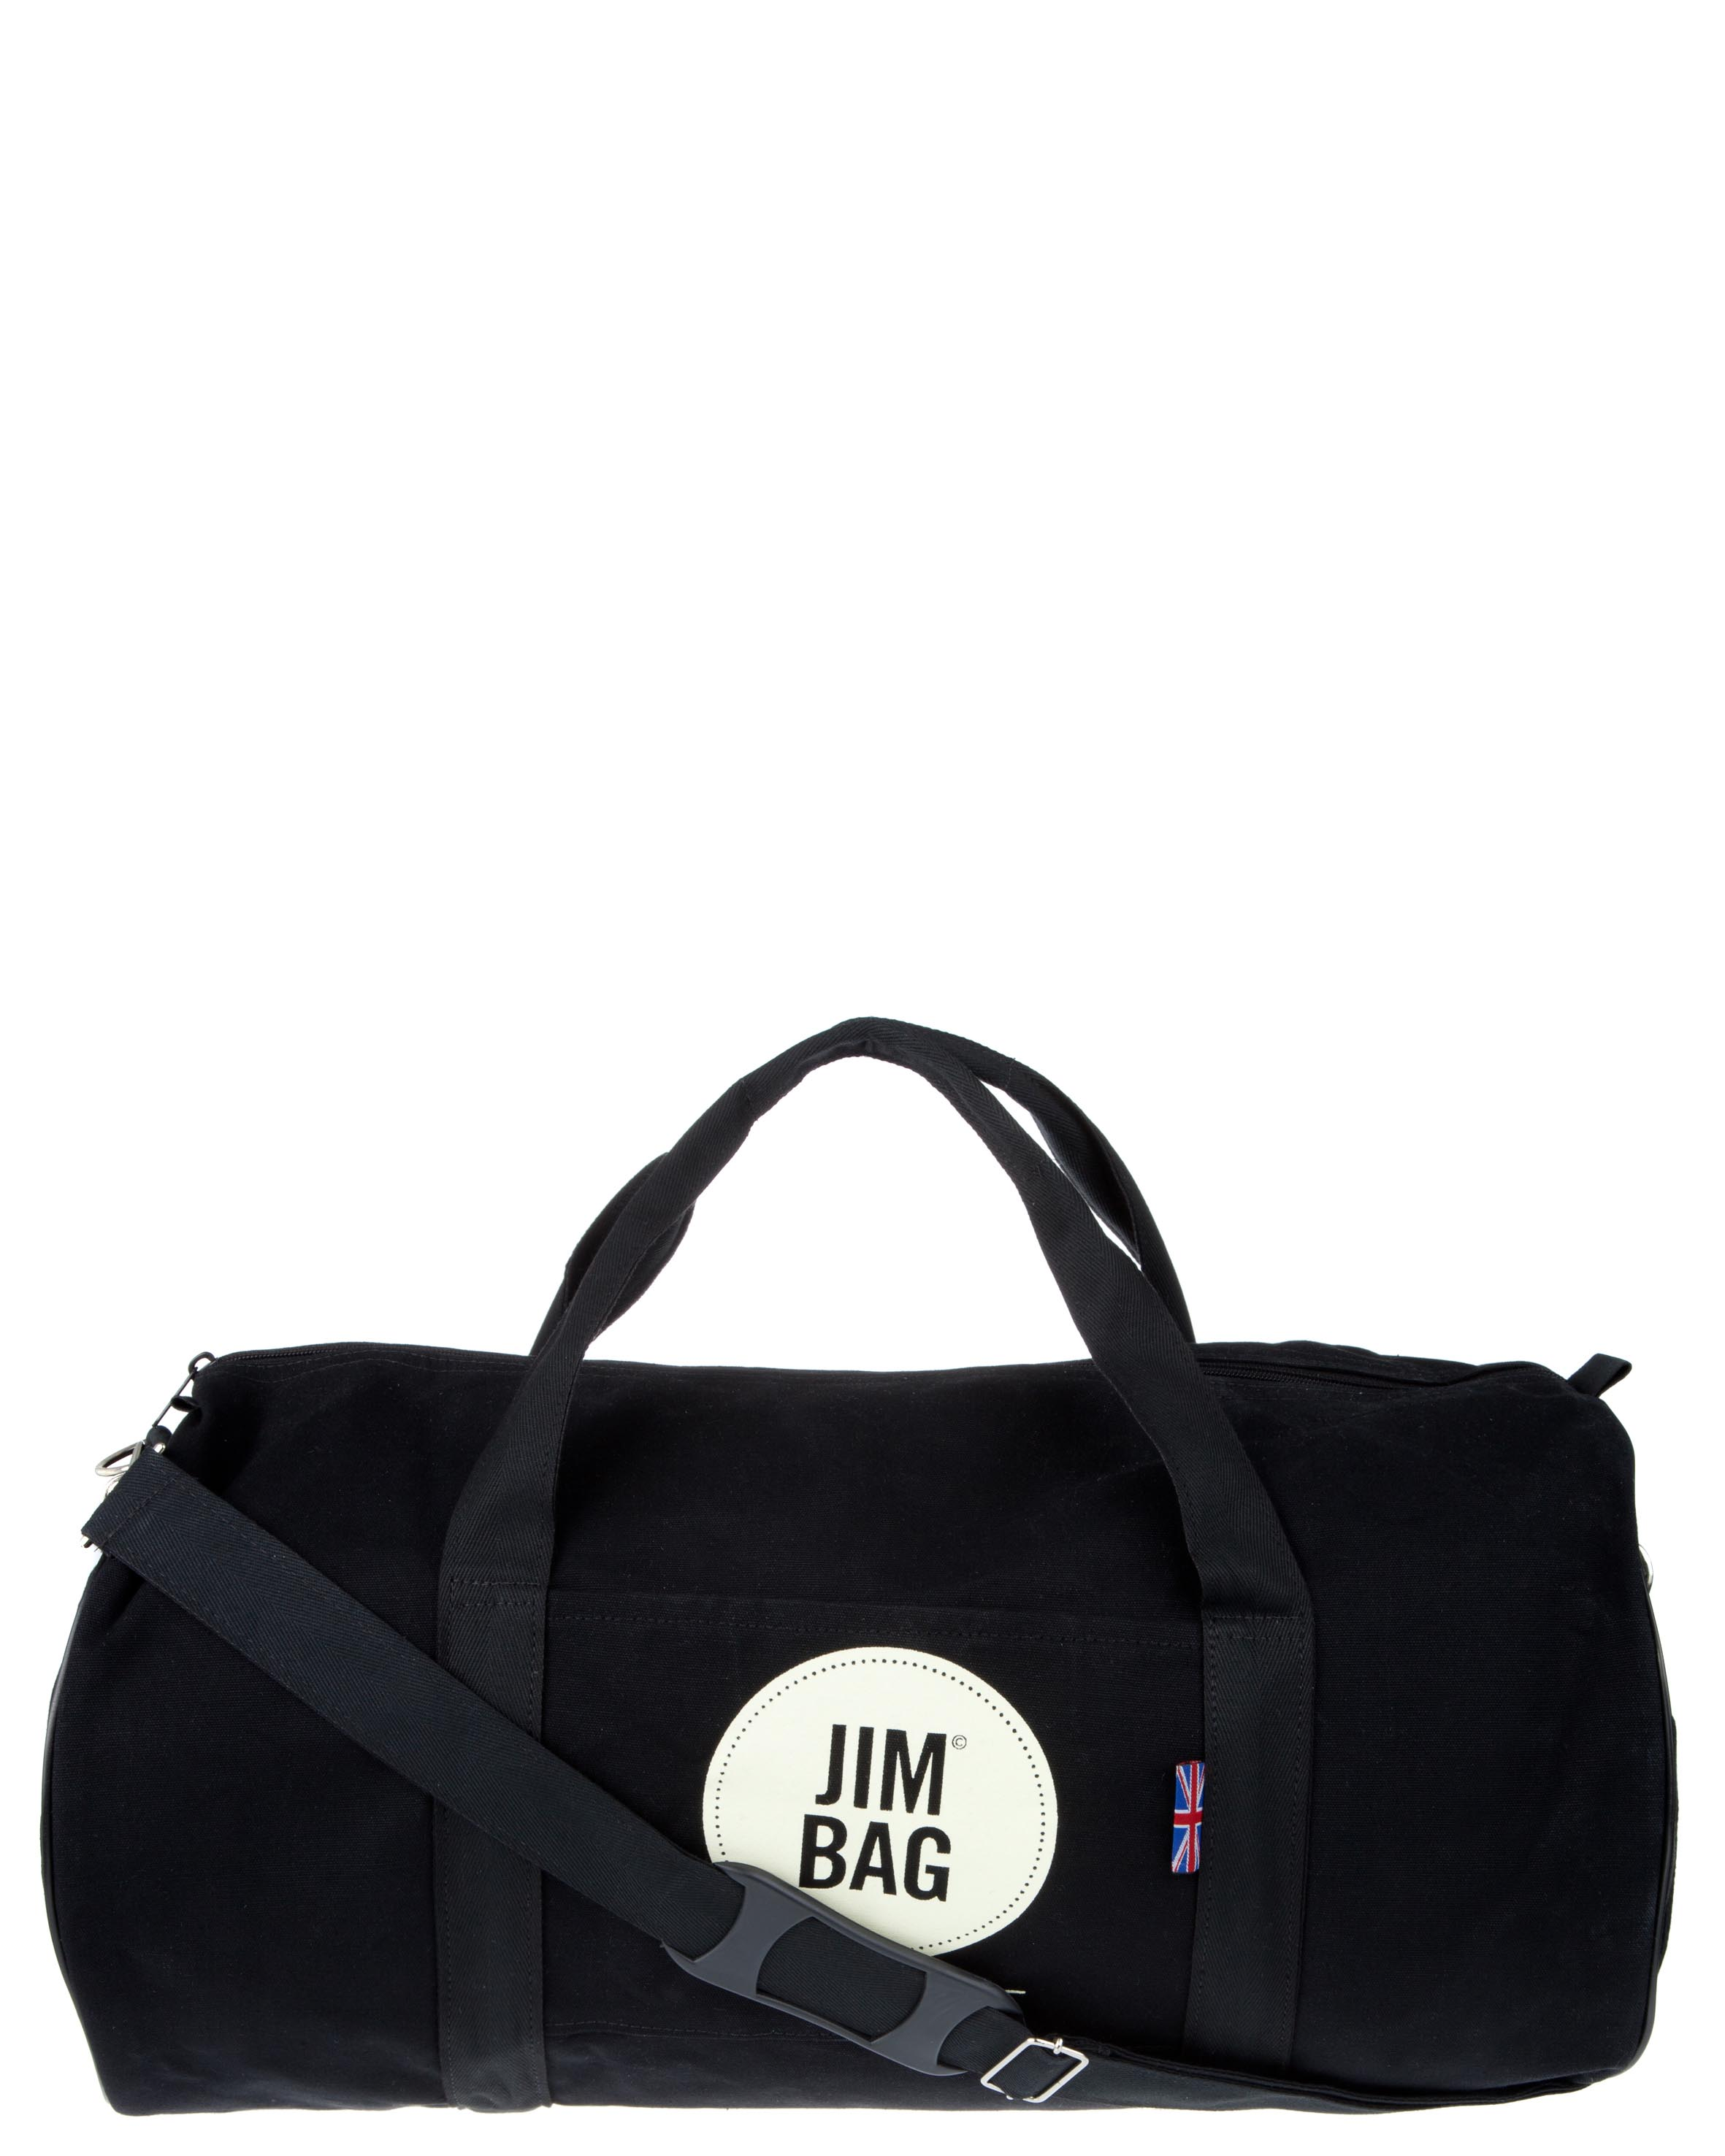 Cheap shoes online Designer bag sale online